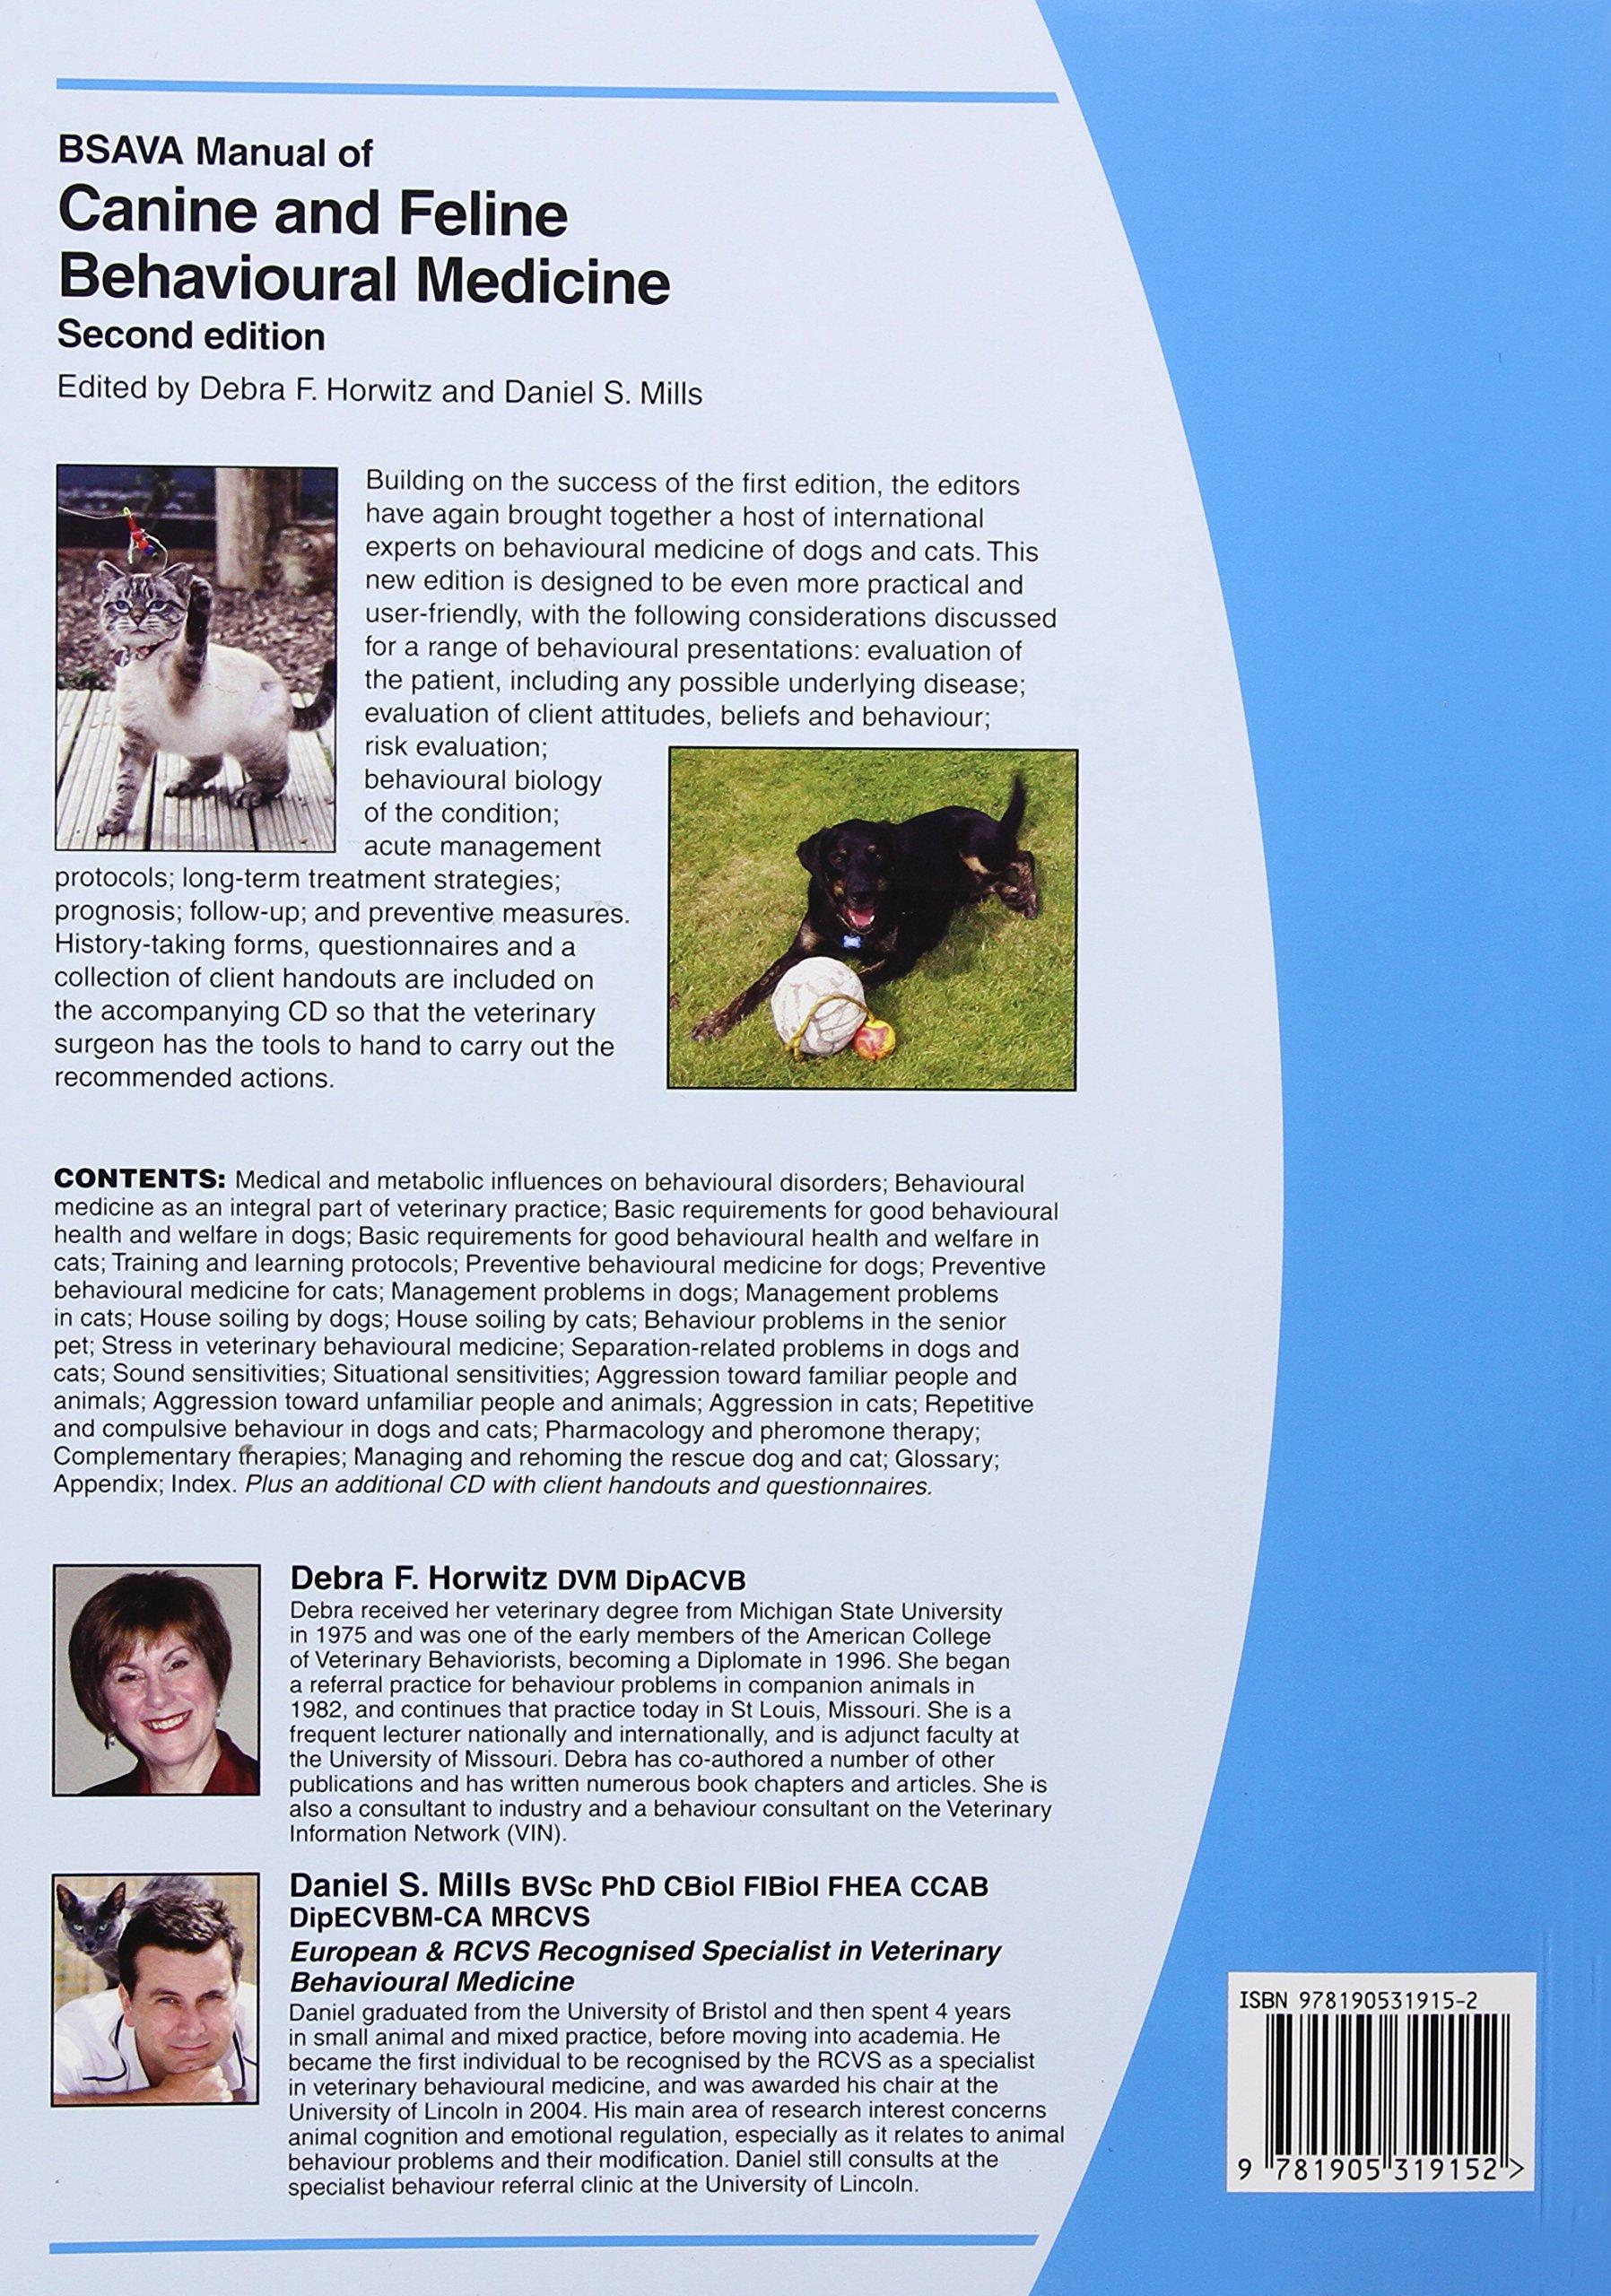 BSAVA Manual of Canine and Feline Behavioural Medicine (BSAVA British Small  Animal Veterinary Association): Amazon.co.uk: Debra F. Horwitz, Daniel S.  Mills: ...